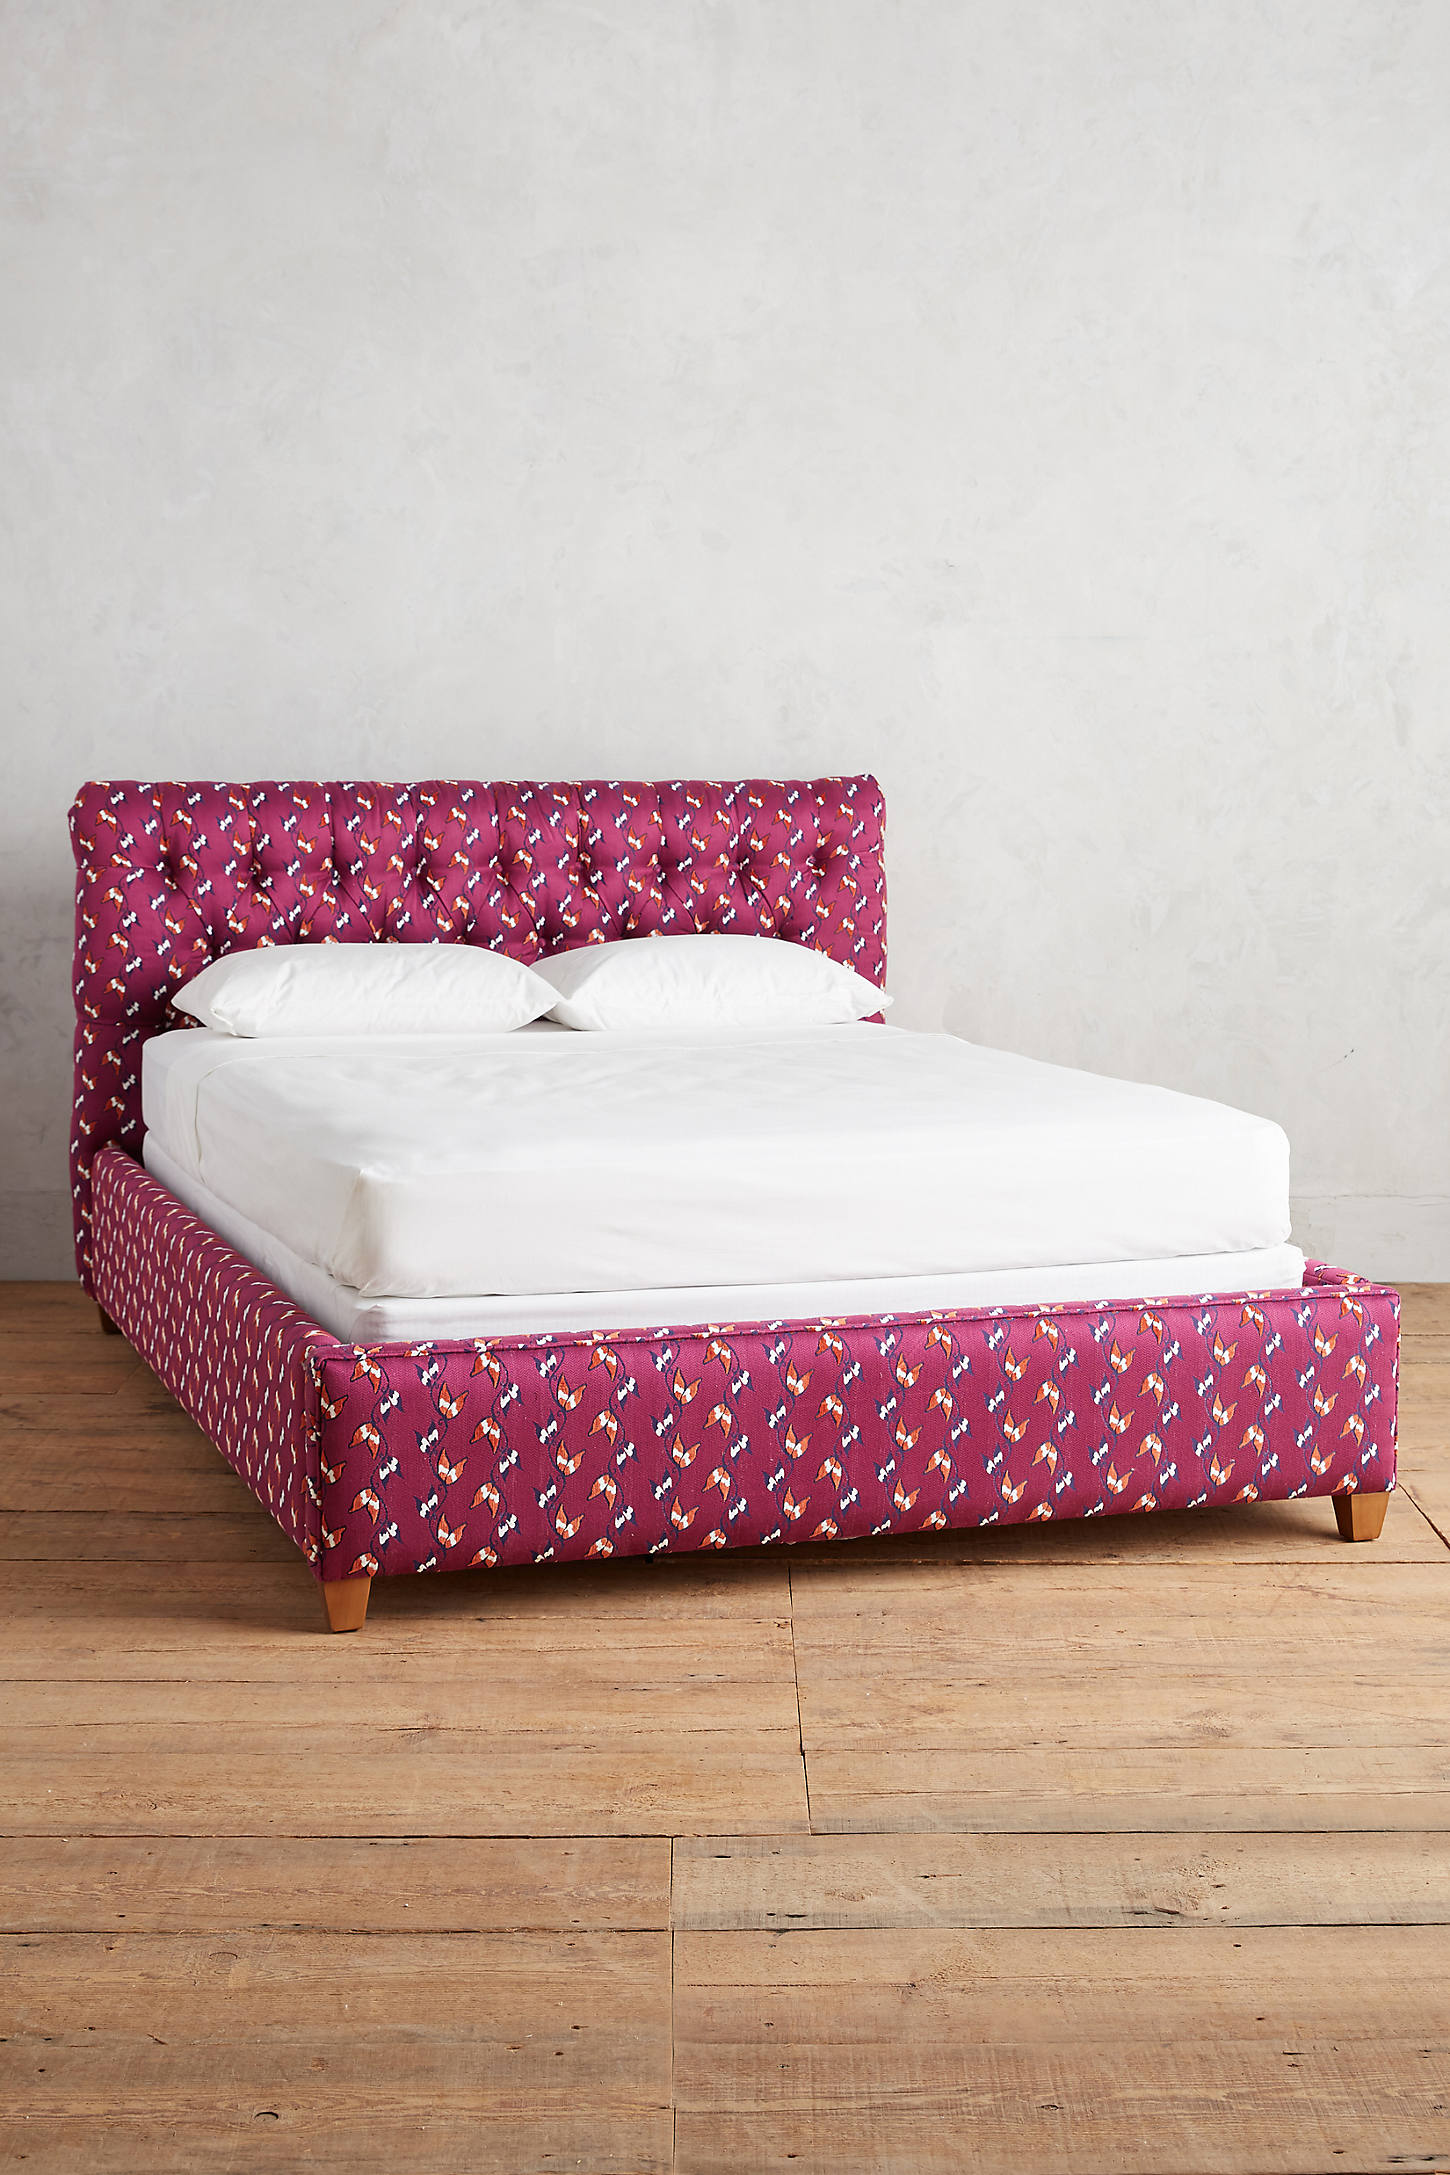 Vine-Woven Lena Bed